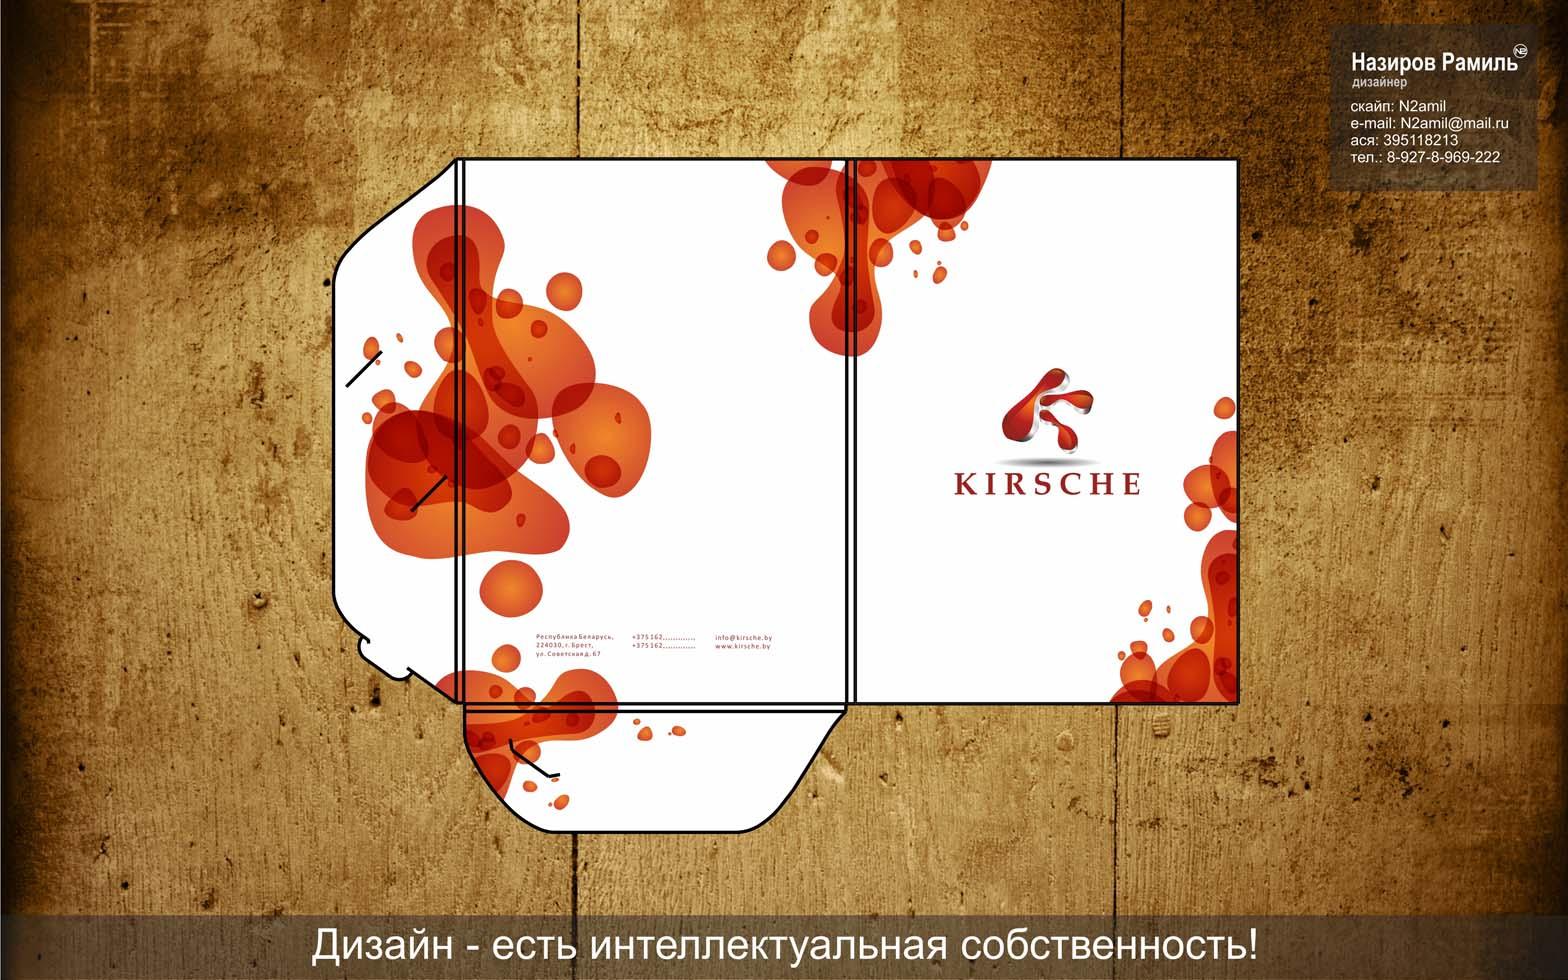 Кирше